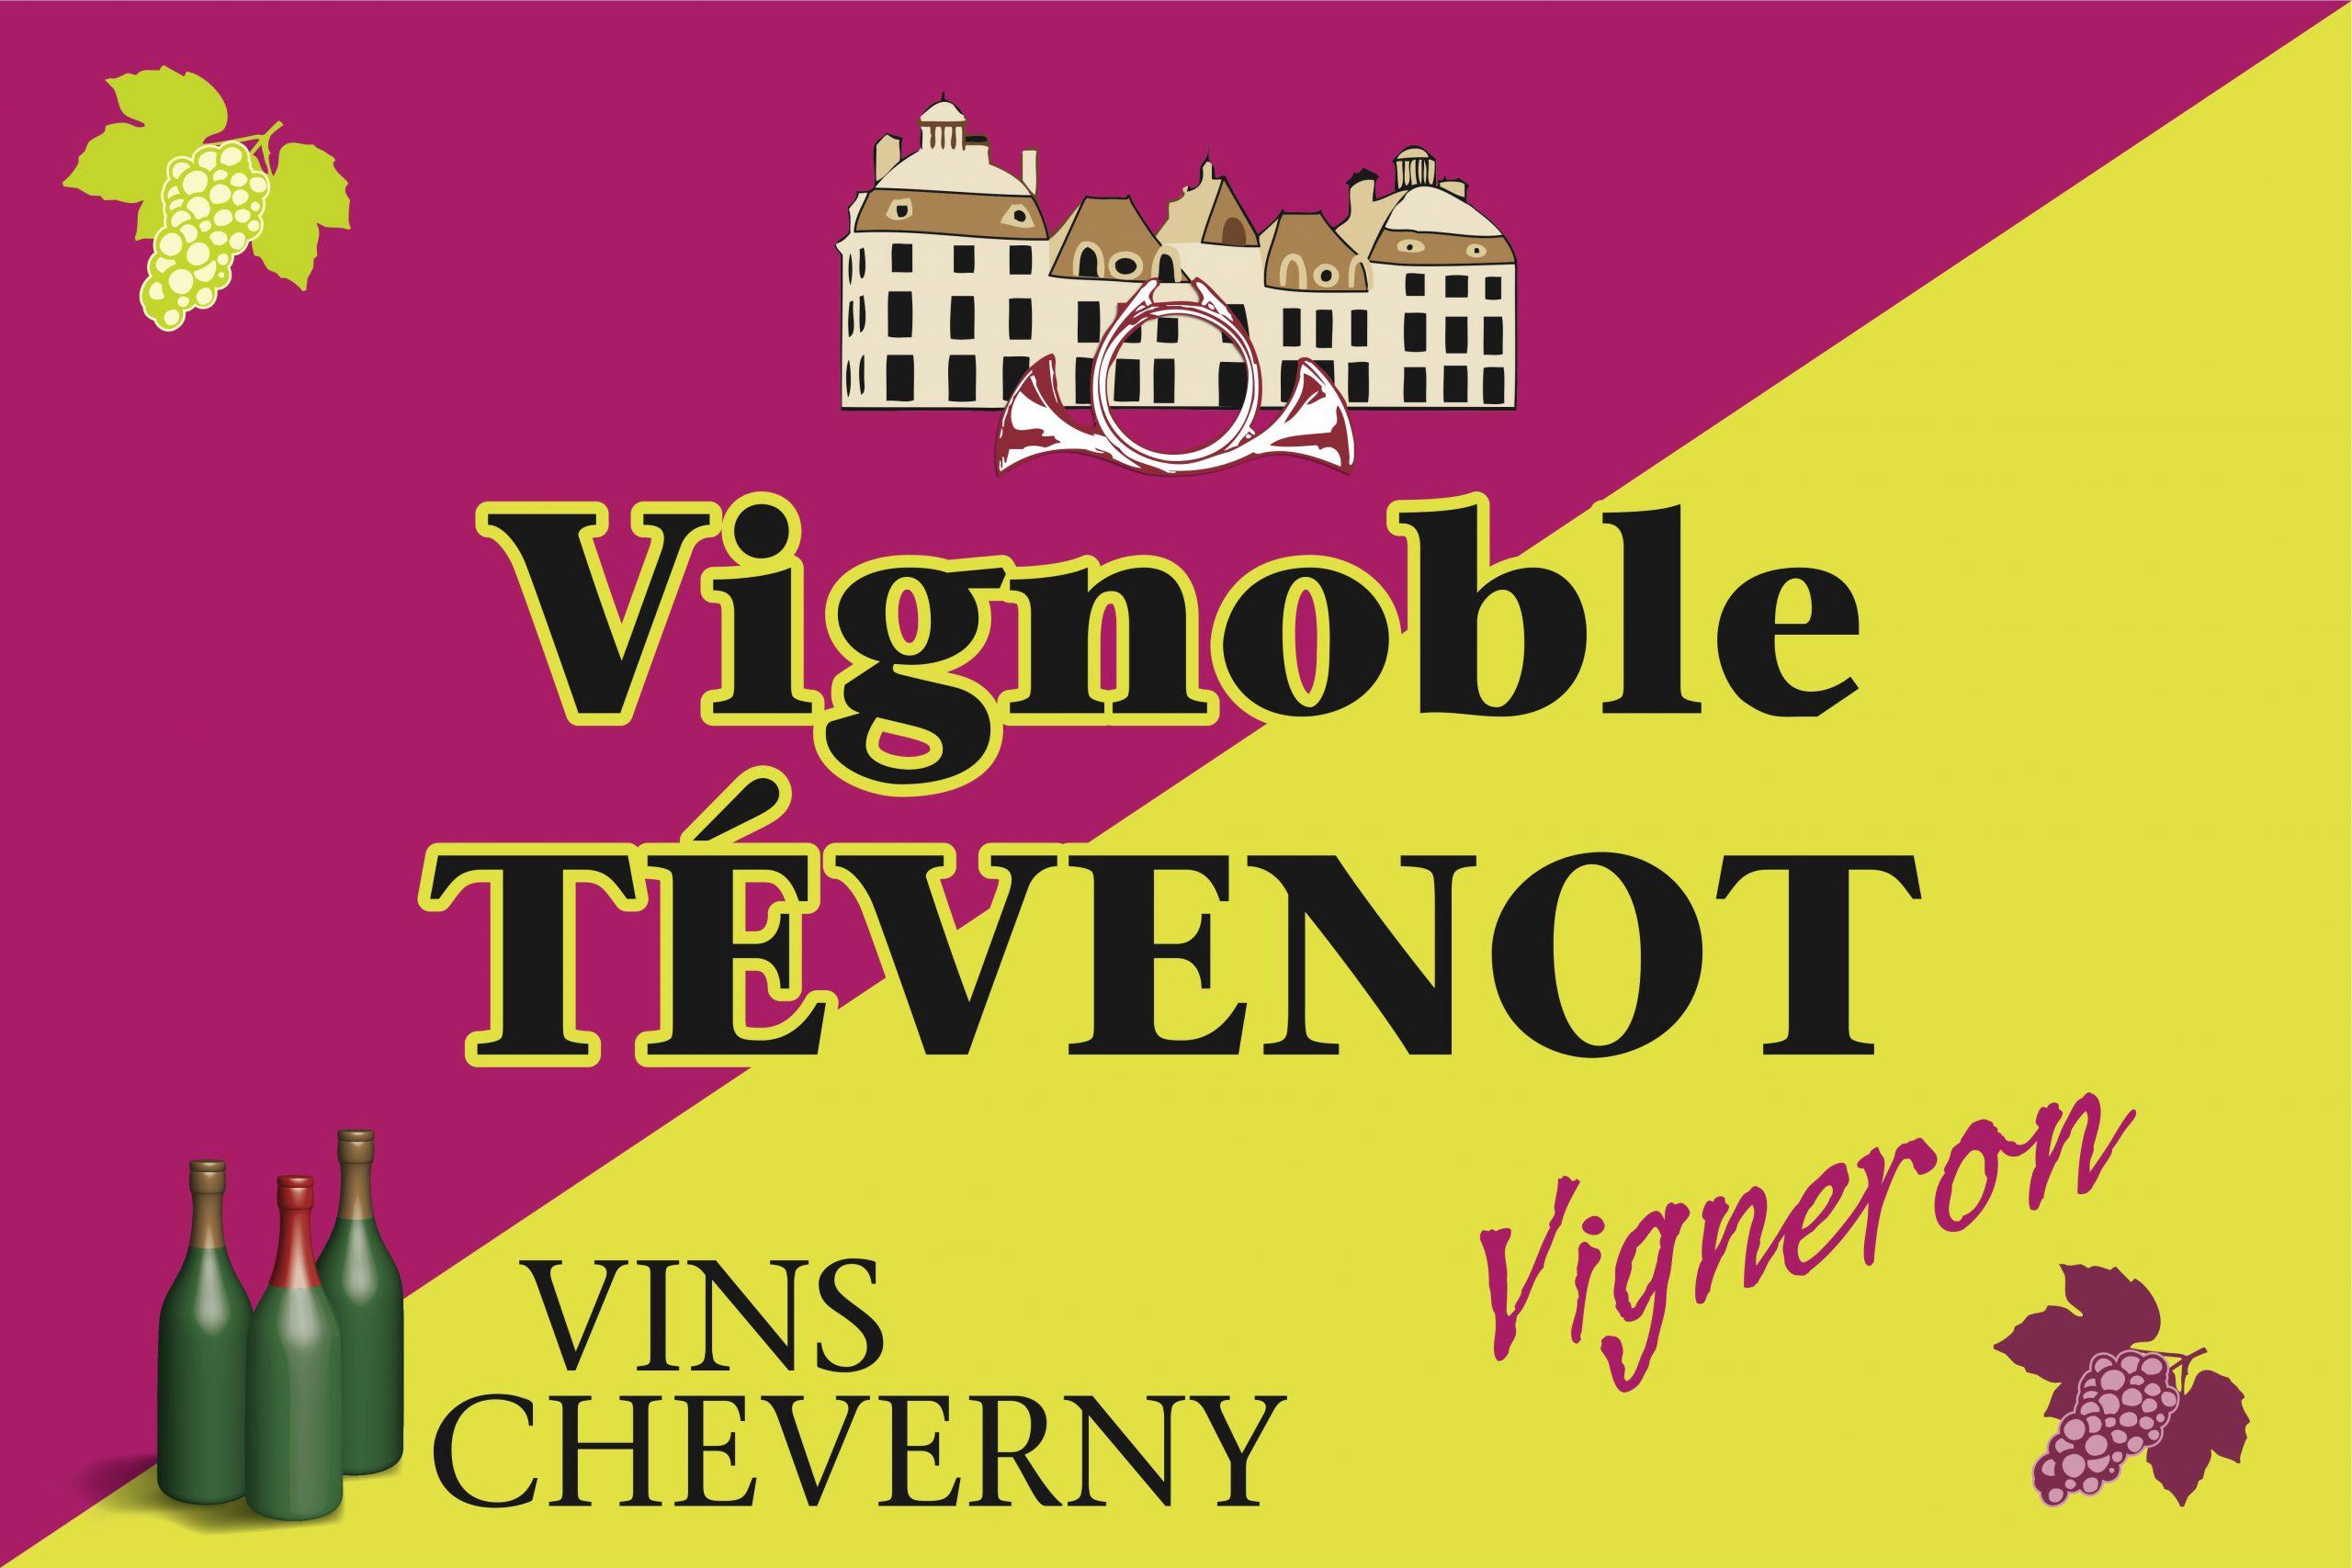 vignoble_tevenot_logo